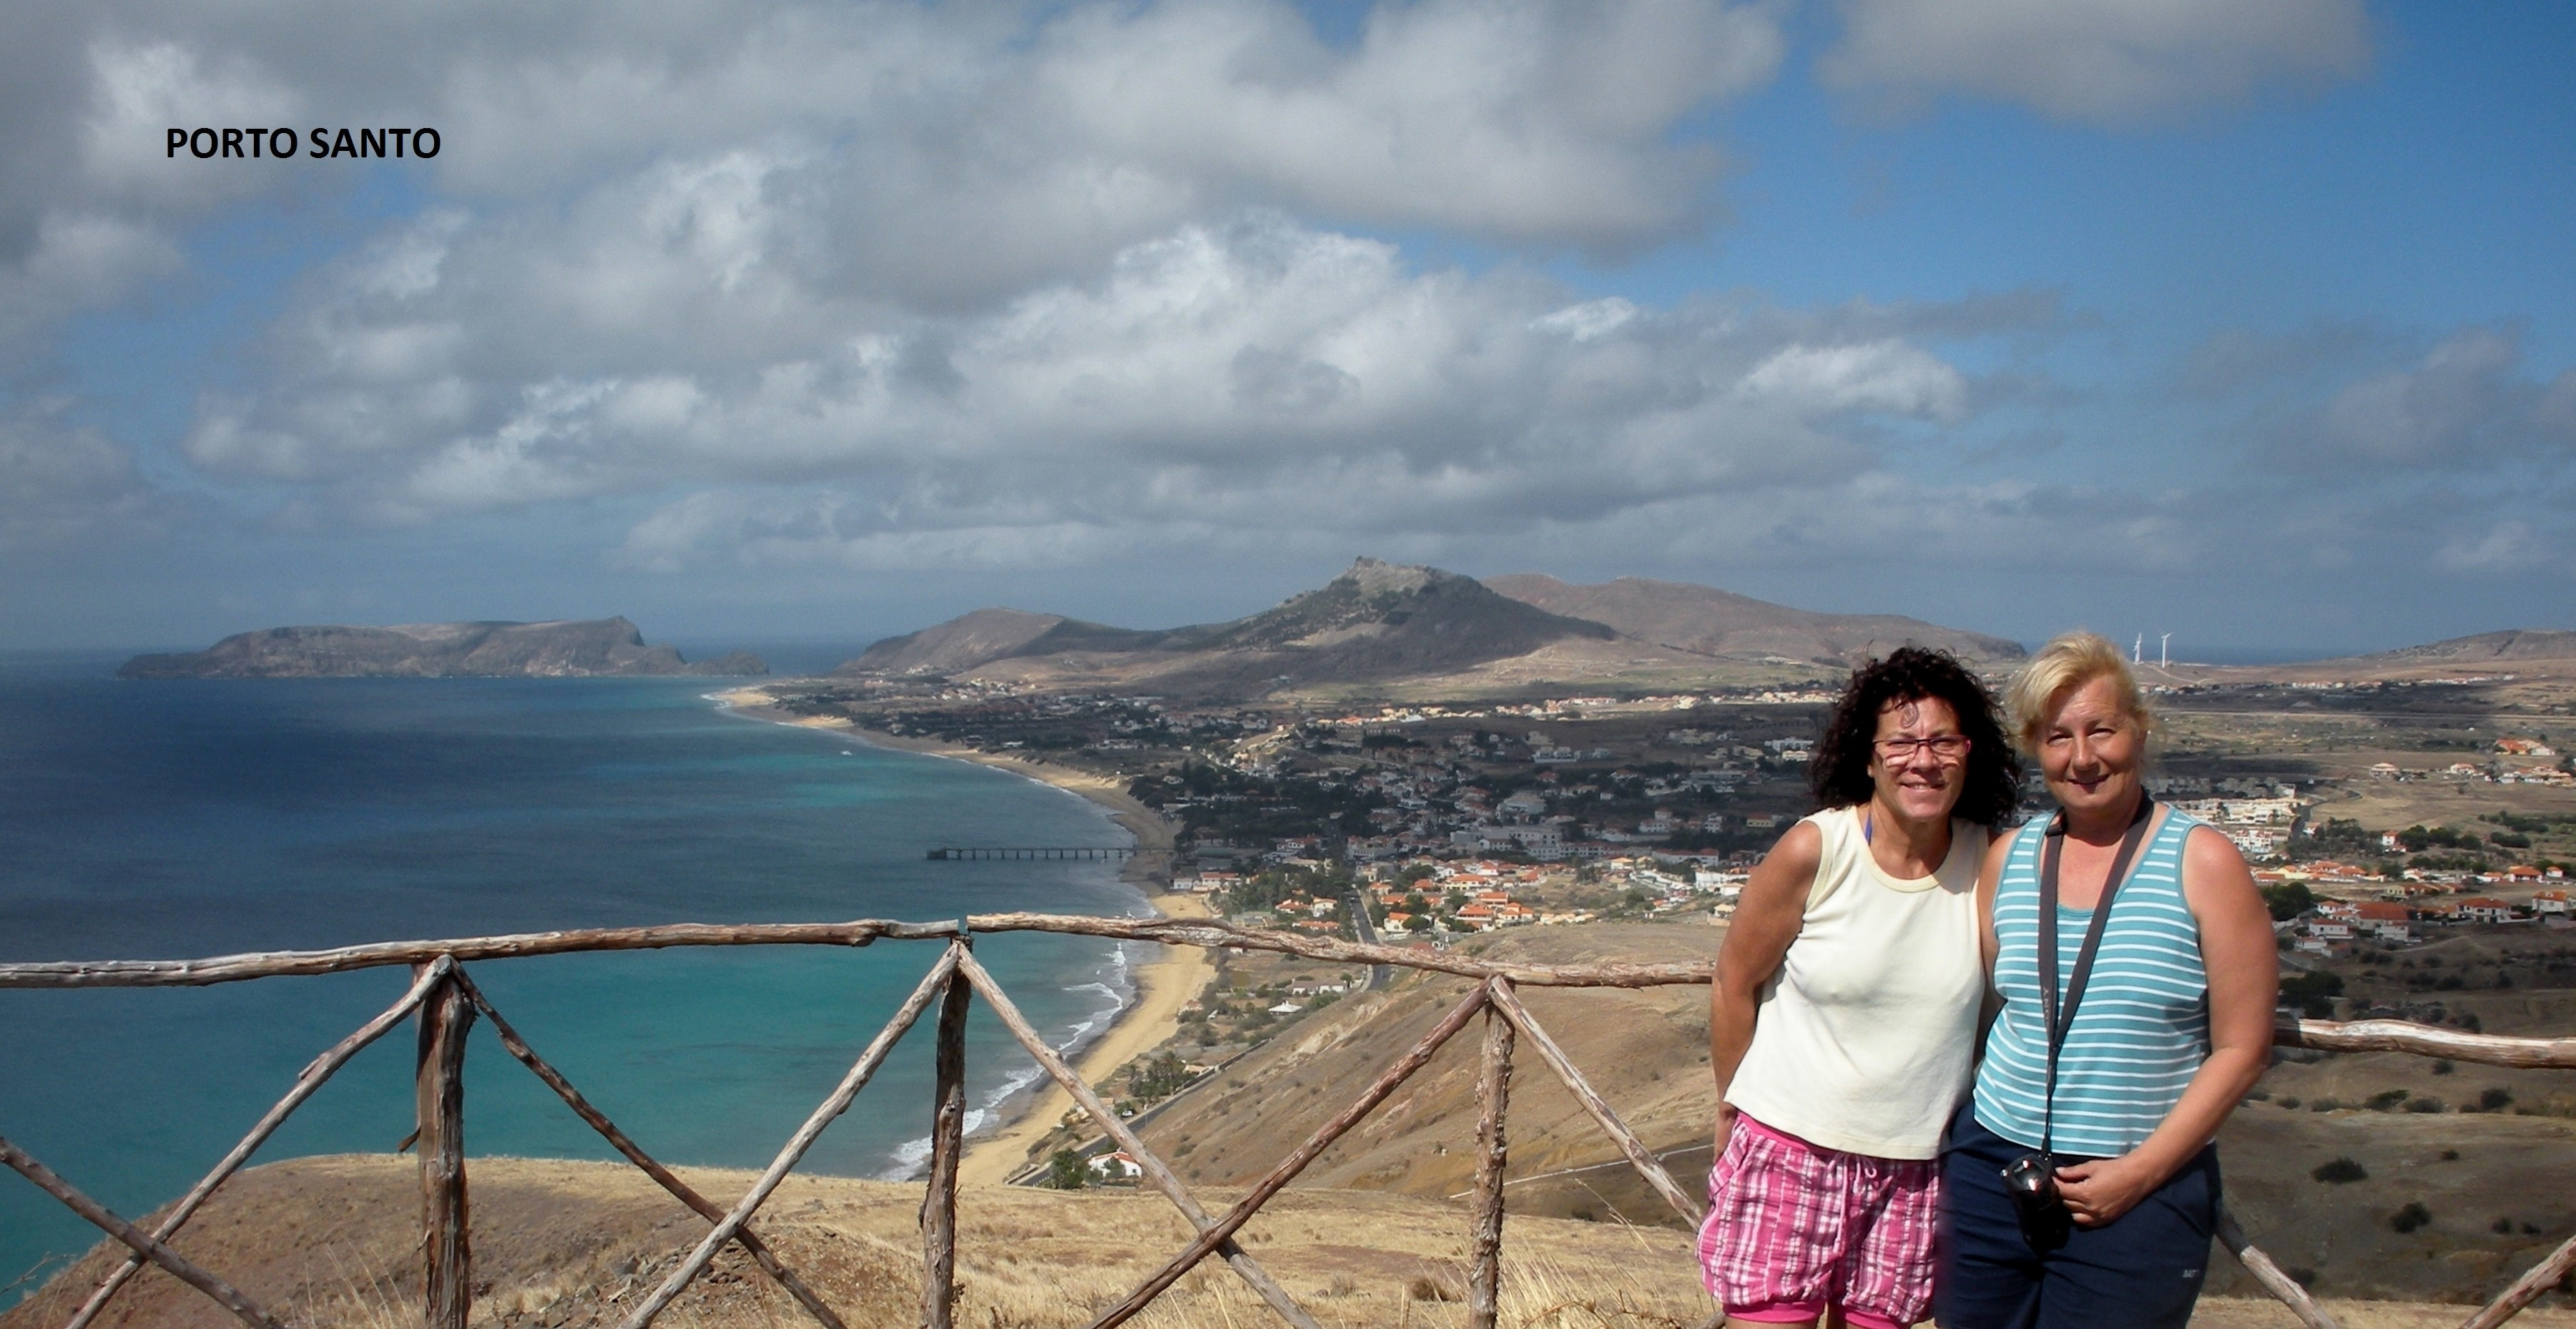 Merche y Valen en la Isla de Porto Santo.